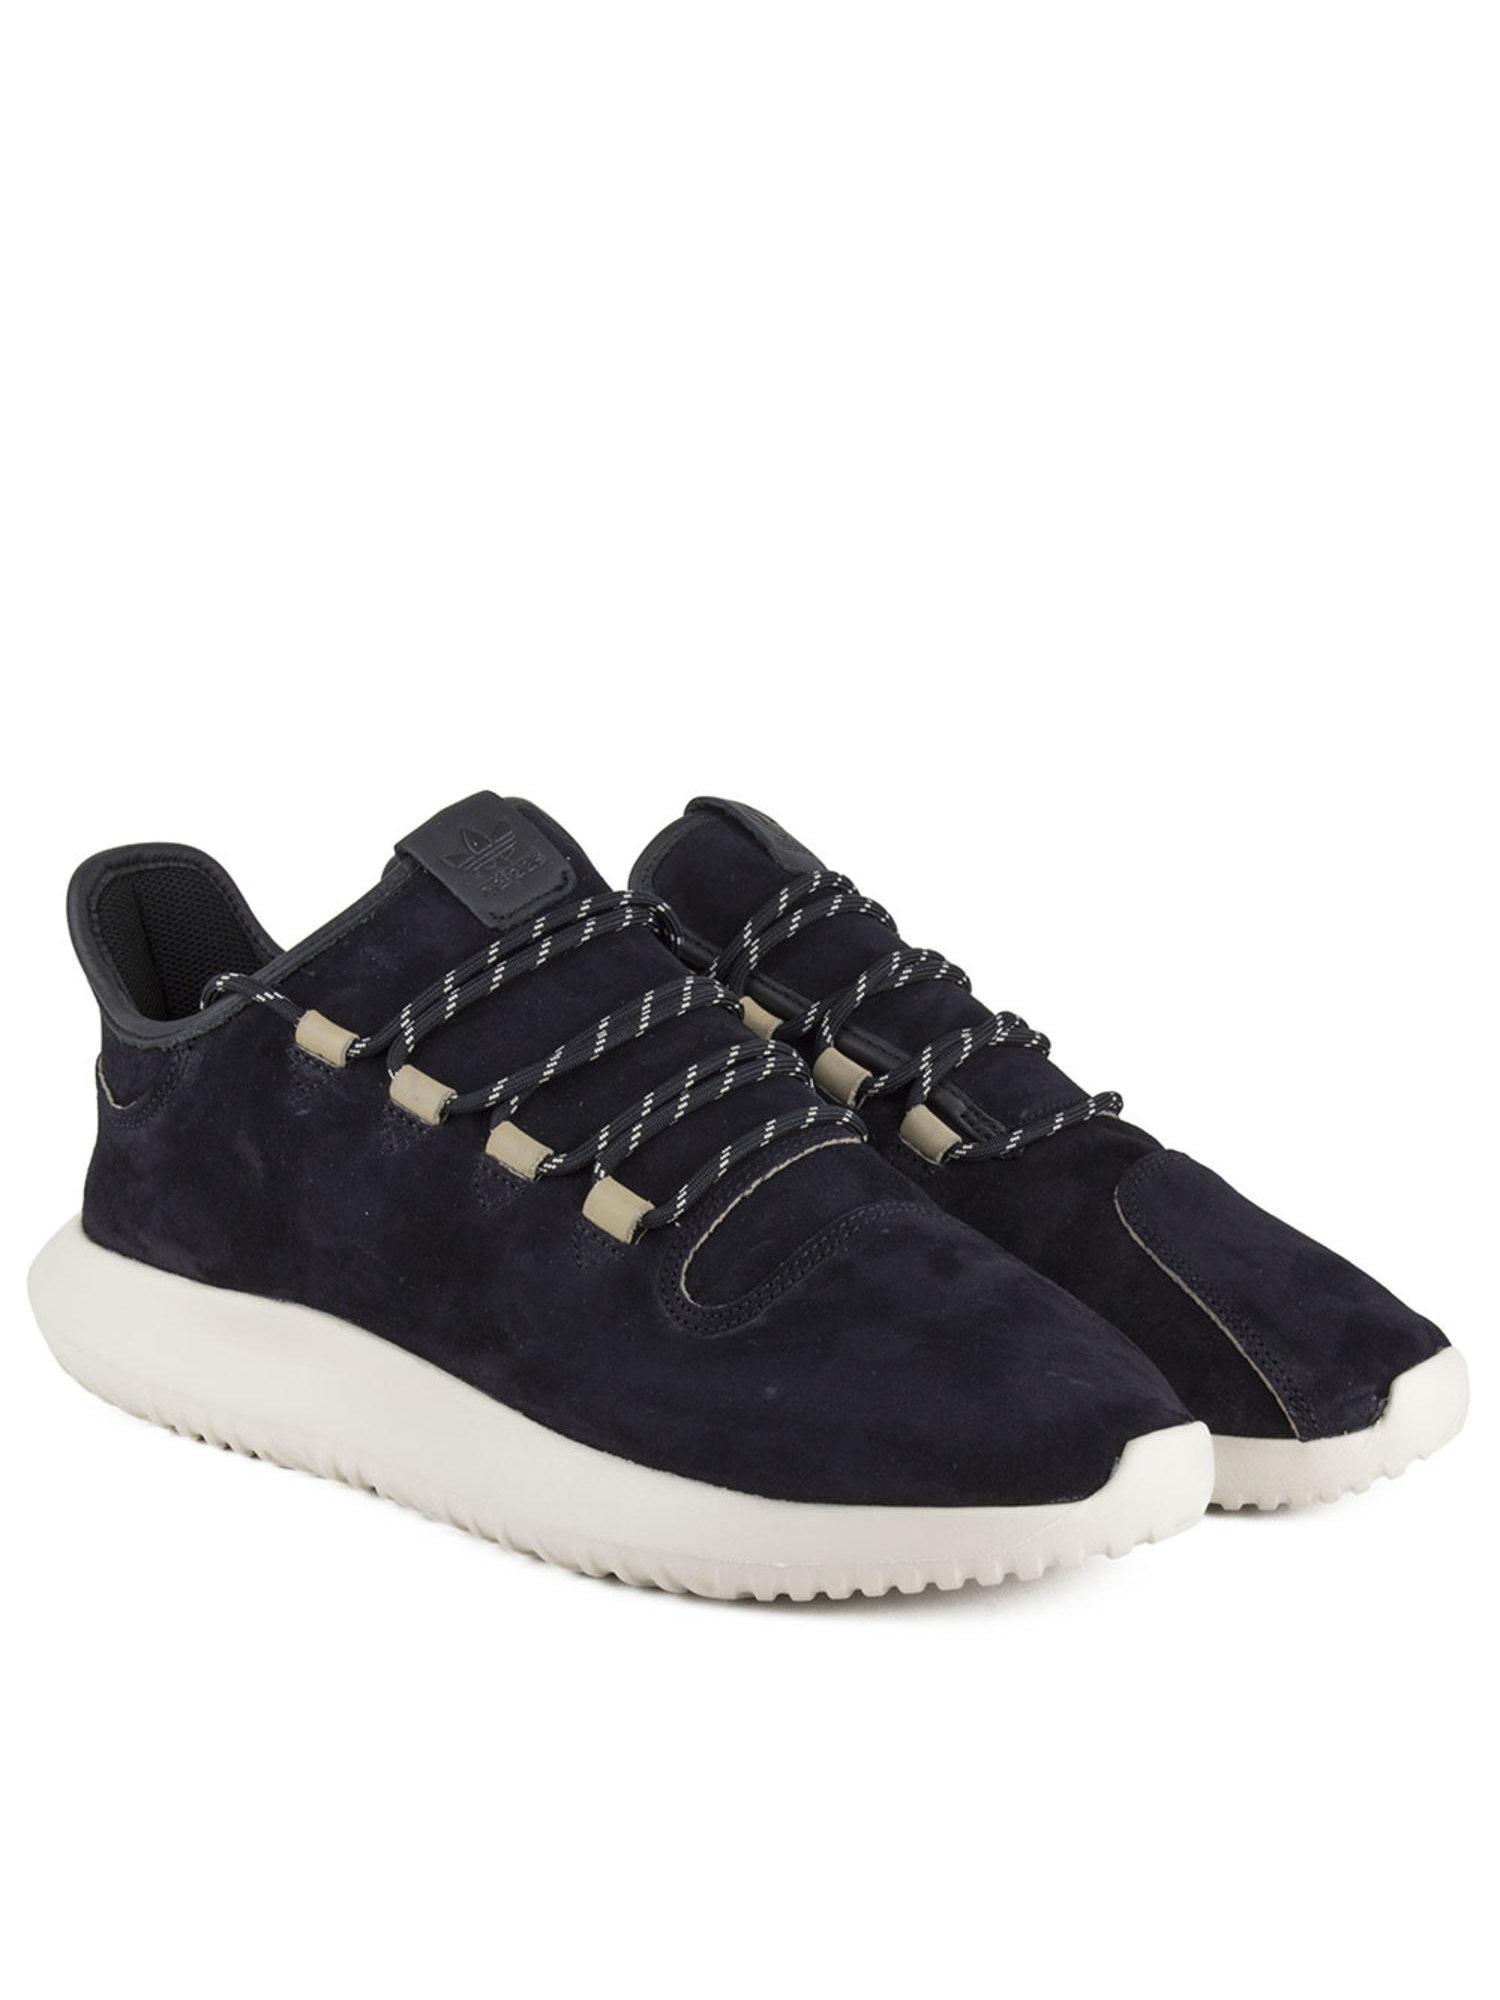 Adidas Deporte Zapatos sportif Zapatos  Deporte Adidas Originals Tubular Shadow Noir a1fd65